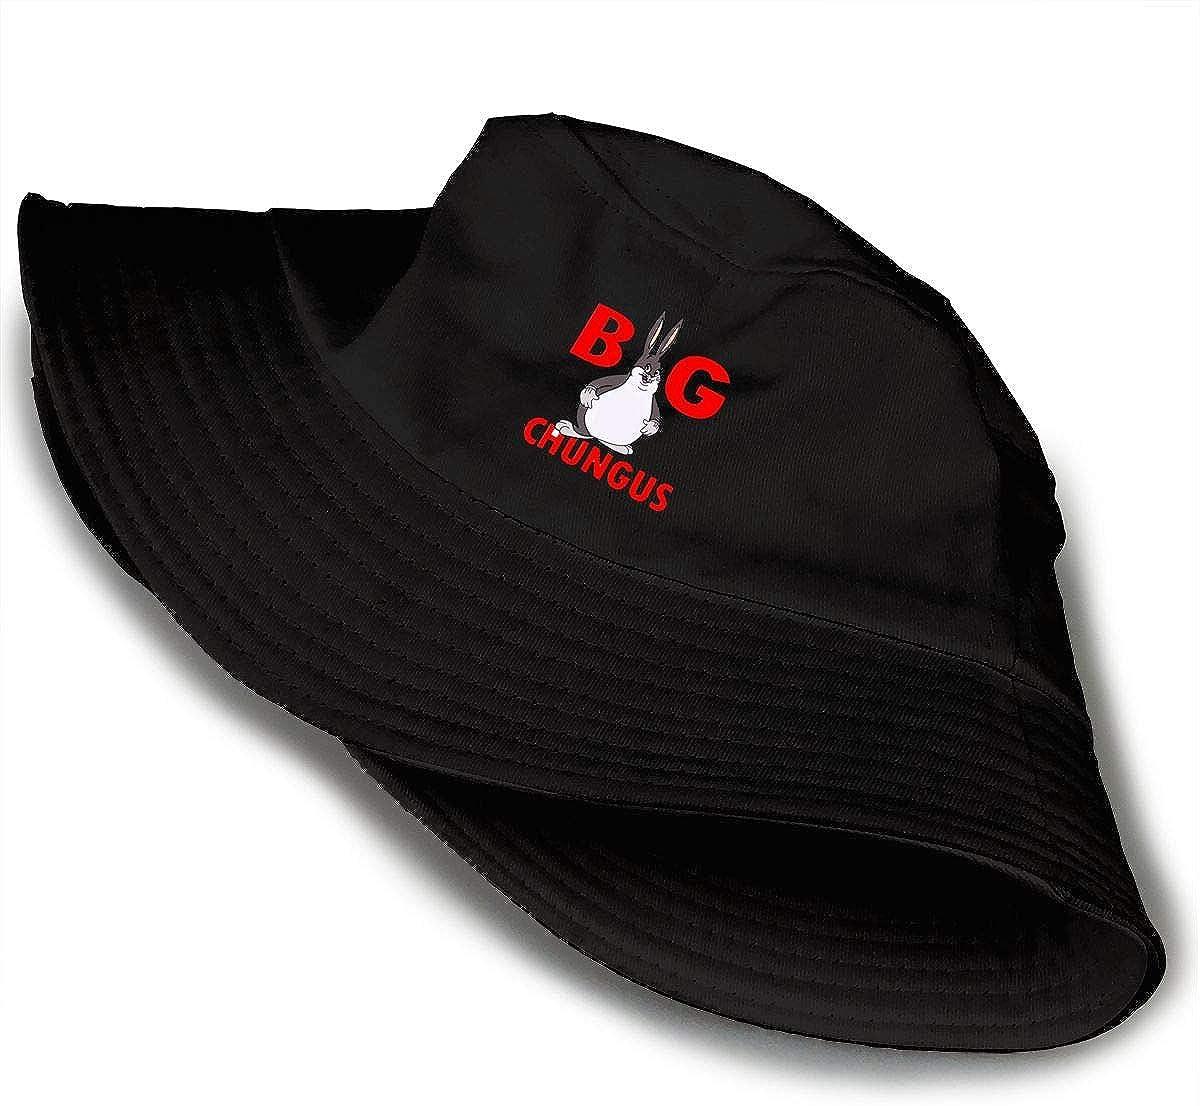 Big Chungus Fashion Sunshade Unisex Hip-Hop Bucket Hat Fisherman Cap